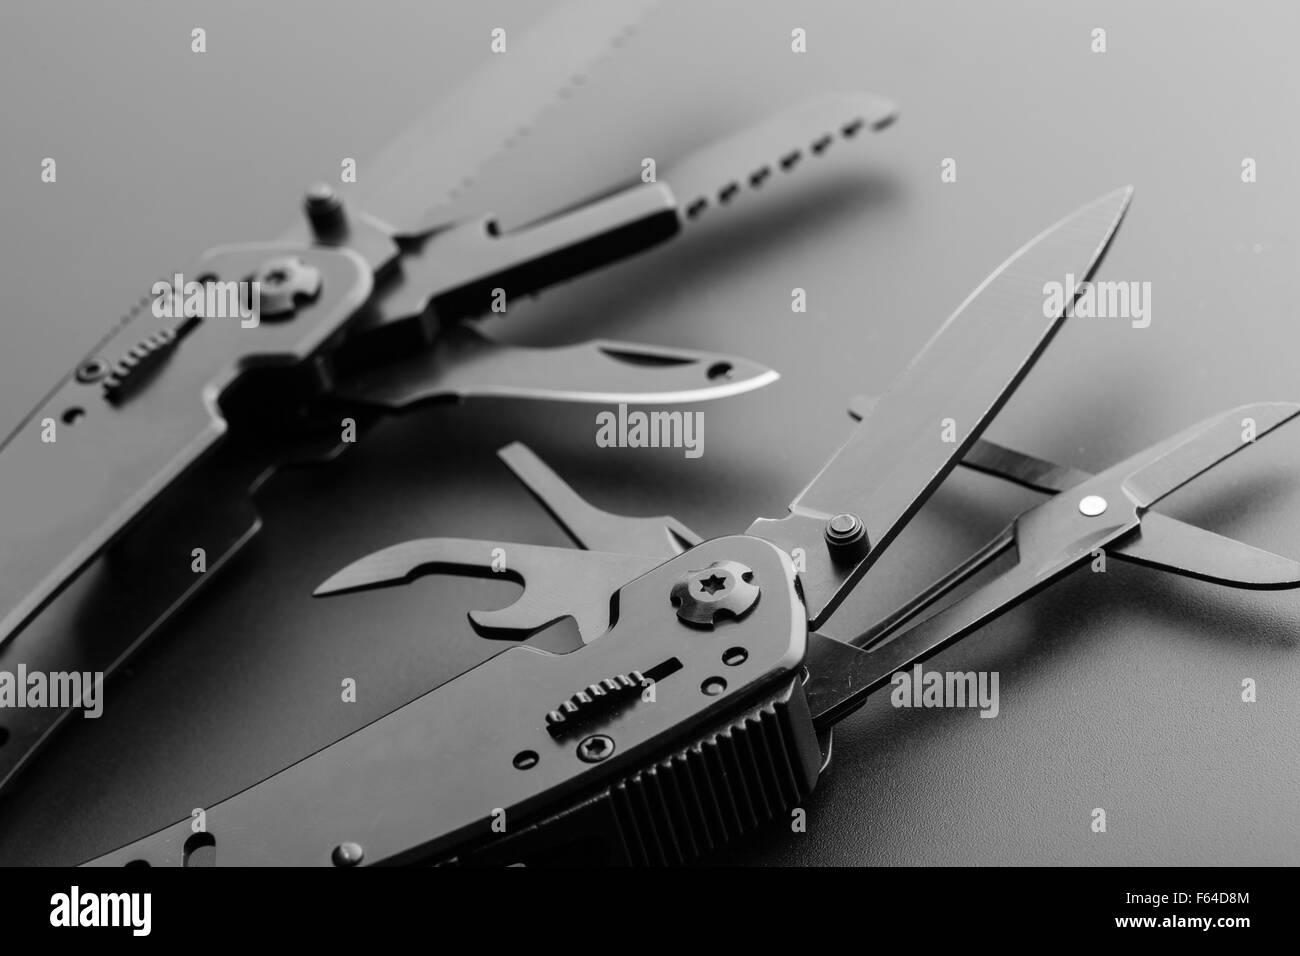 Black opened multitool knife closeup - Stock Image